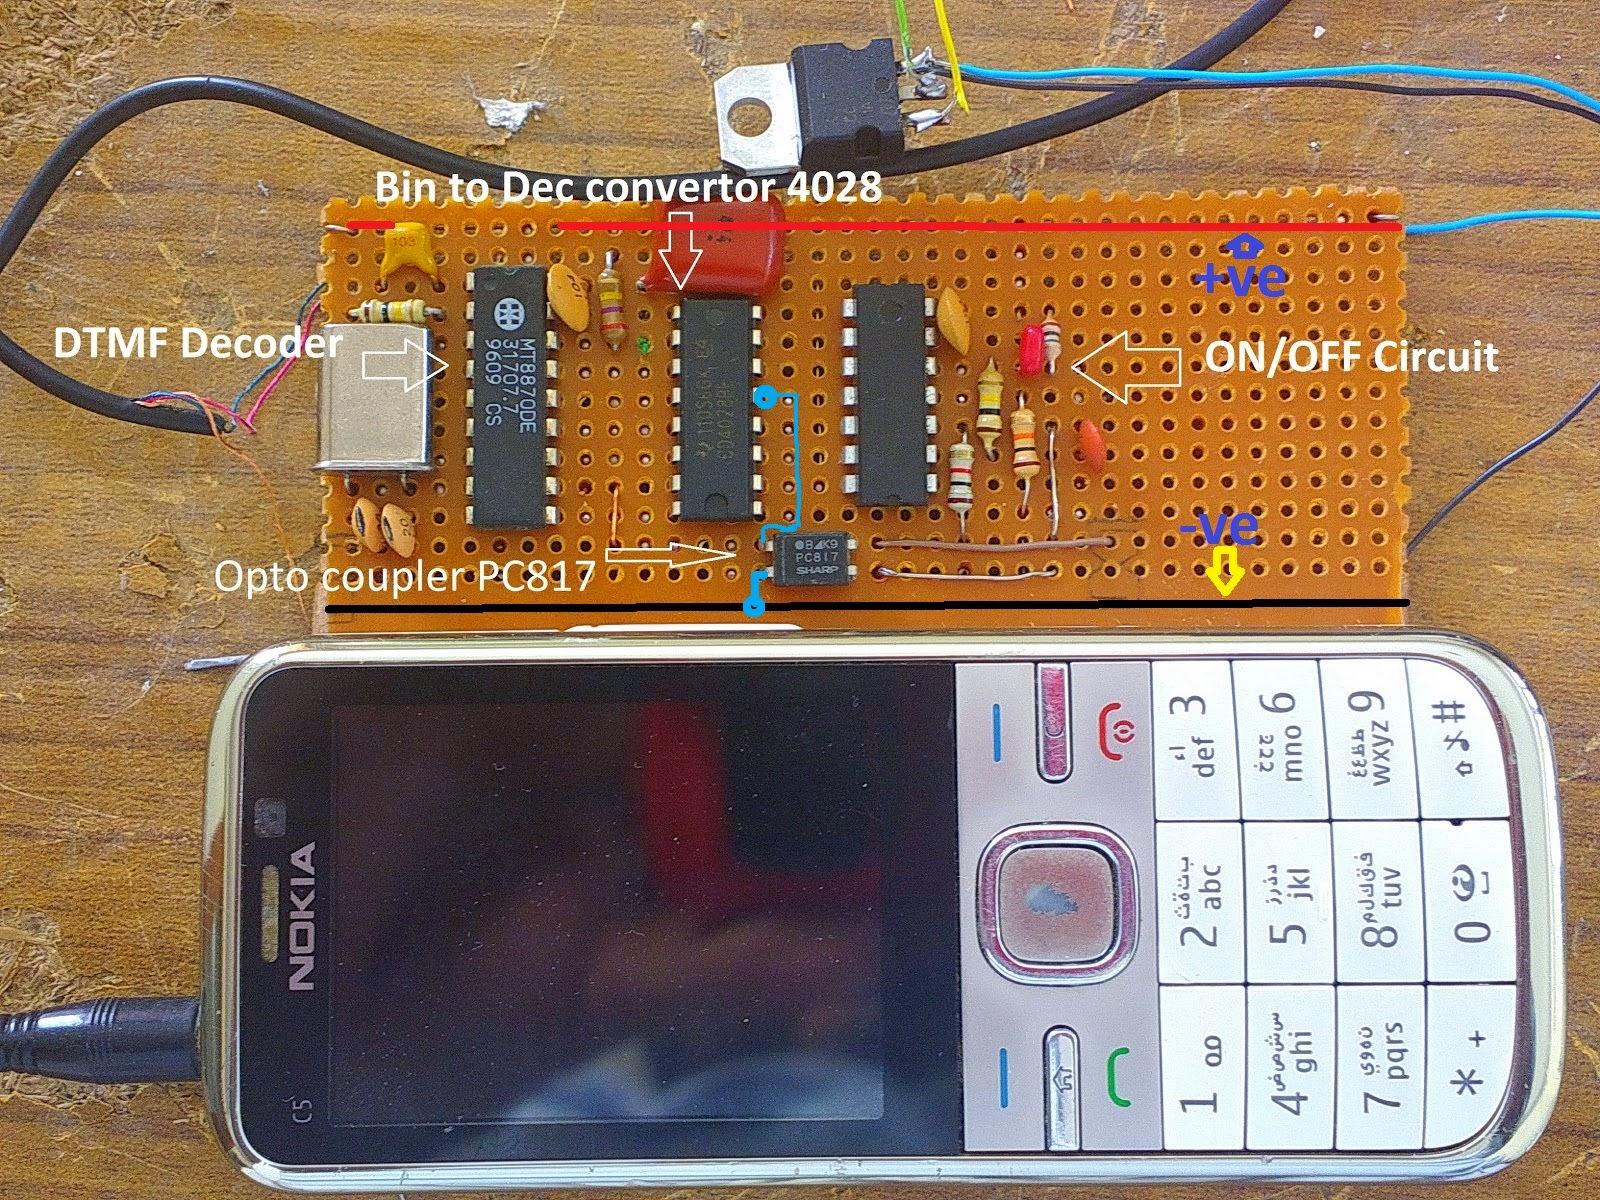 KSF ELECTRONICS: ON/OFF Switch GSM based (DTMF)